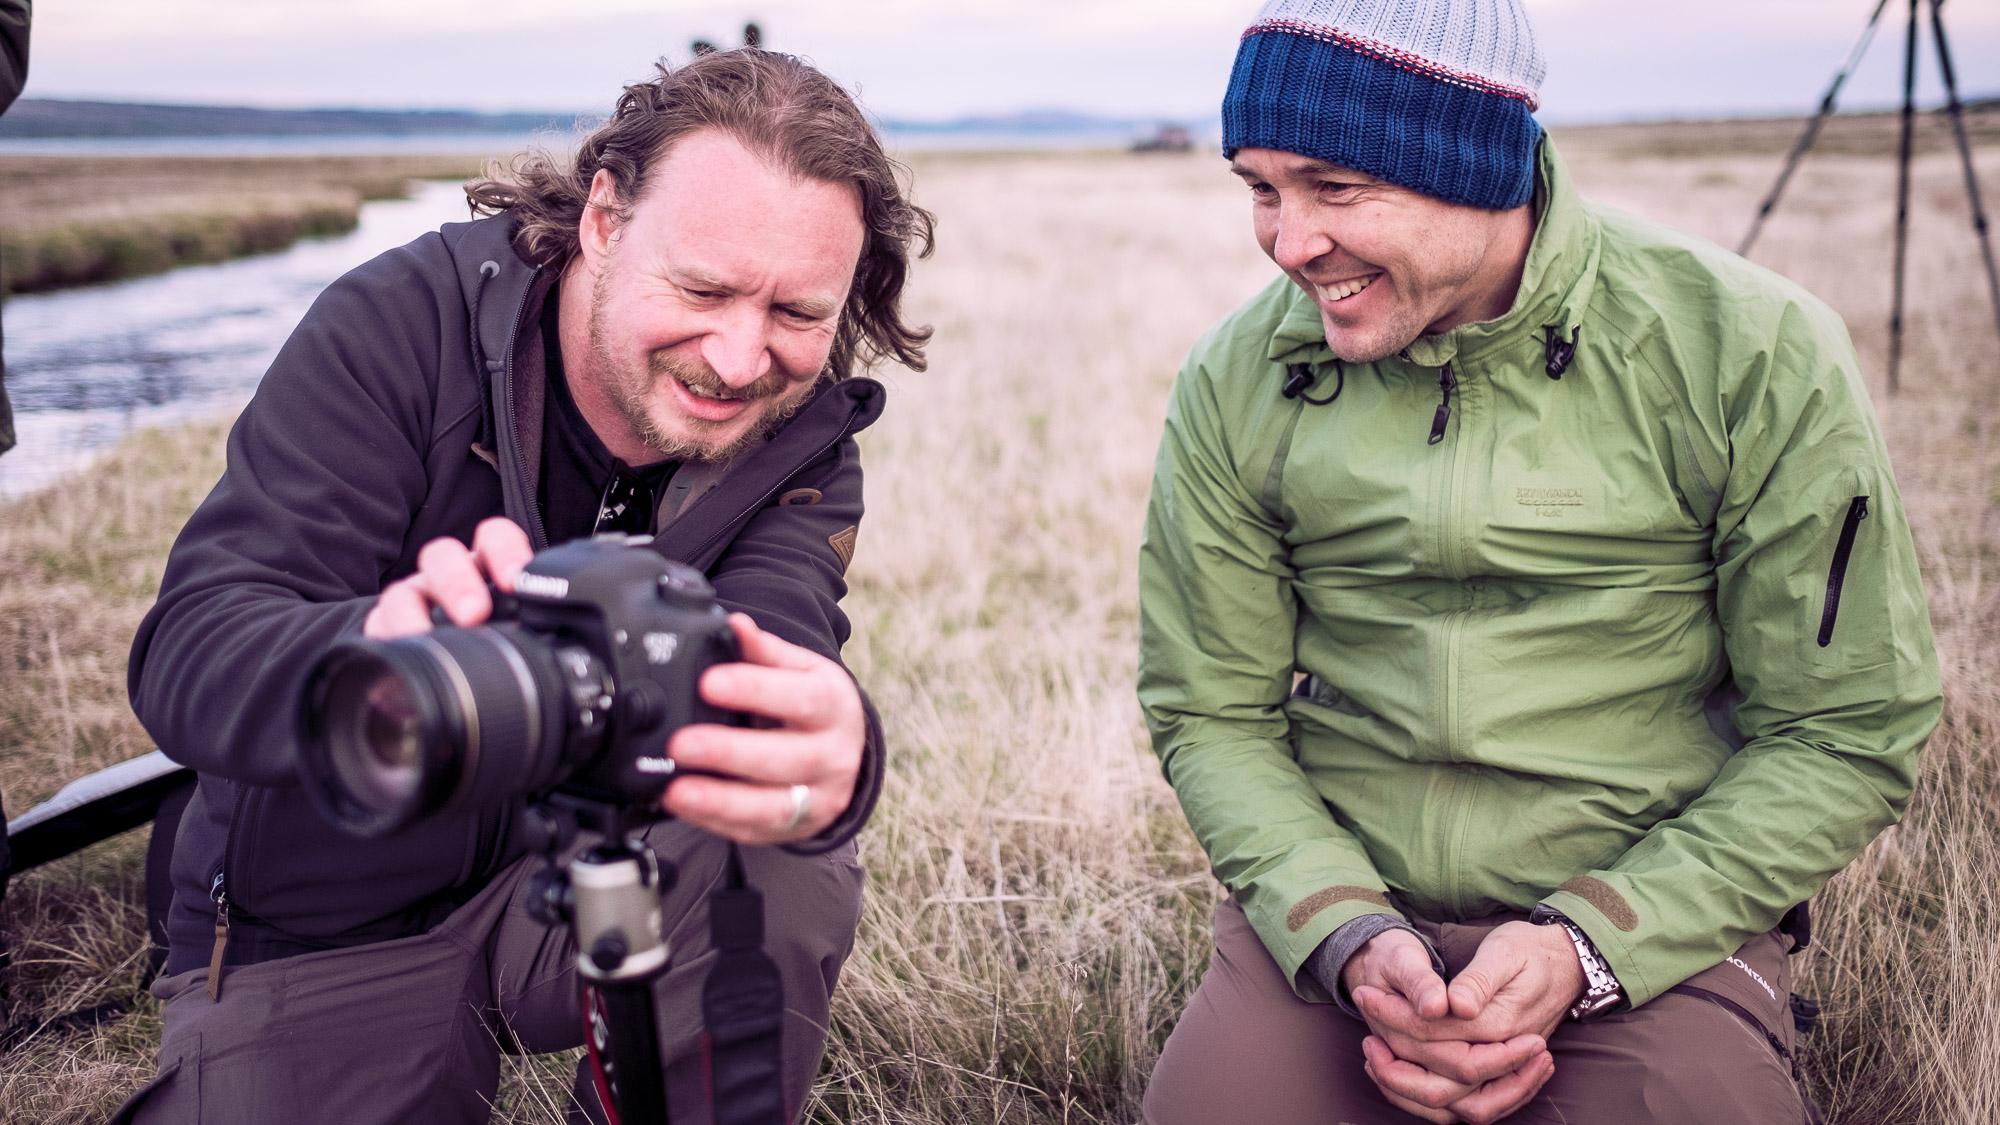 photography-workshop-newzealand-mountcook2018-21.jpg